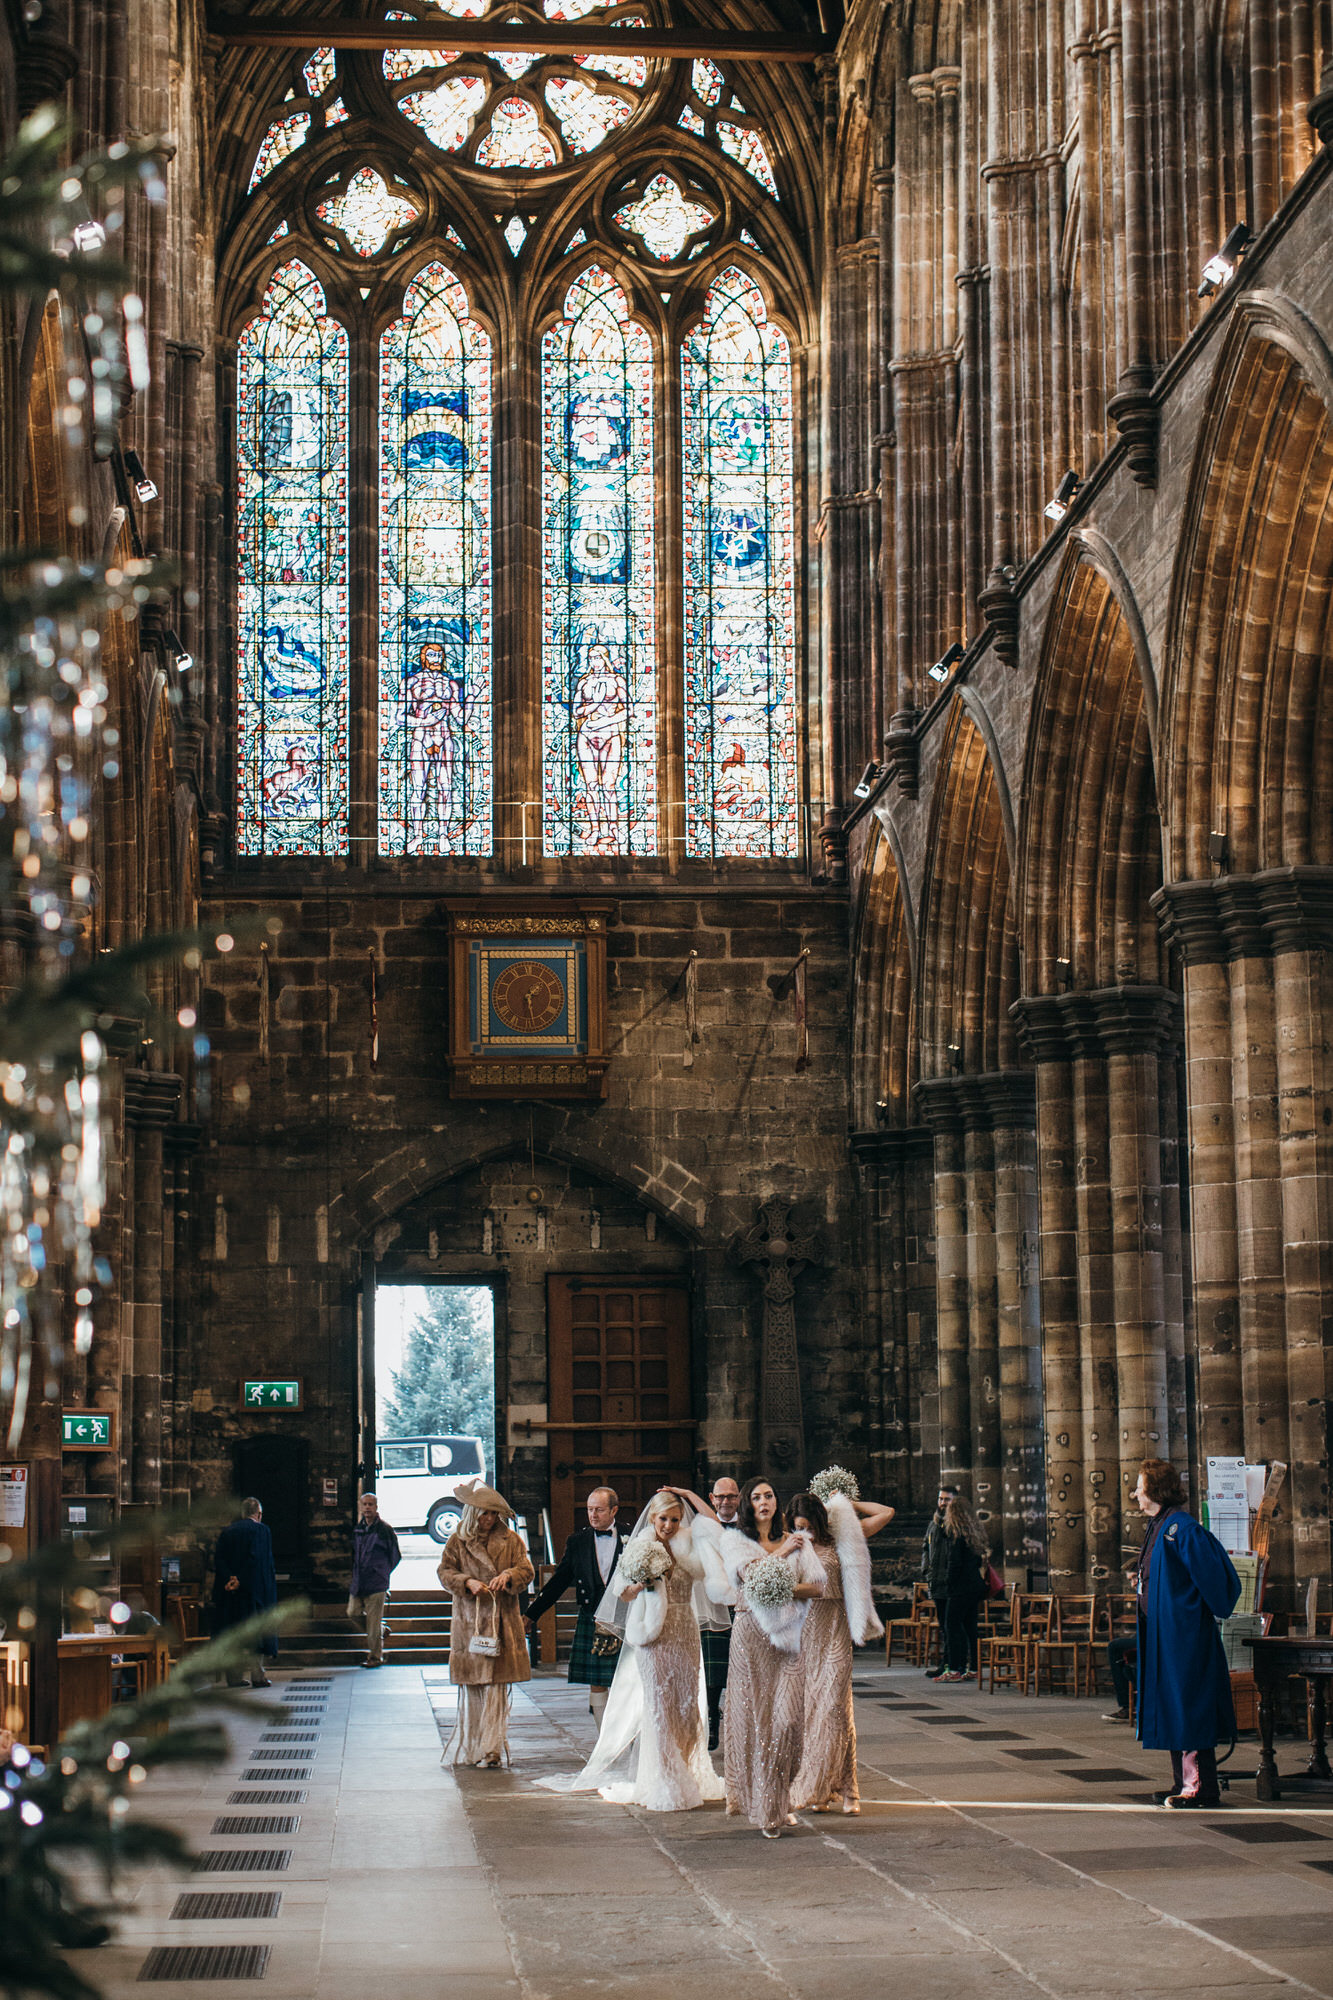 Glasgow Cathedral wedding photographer